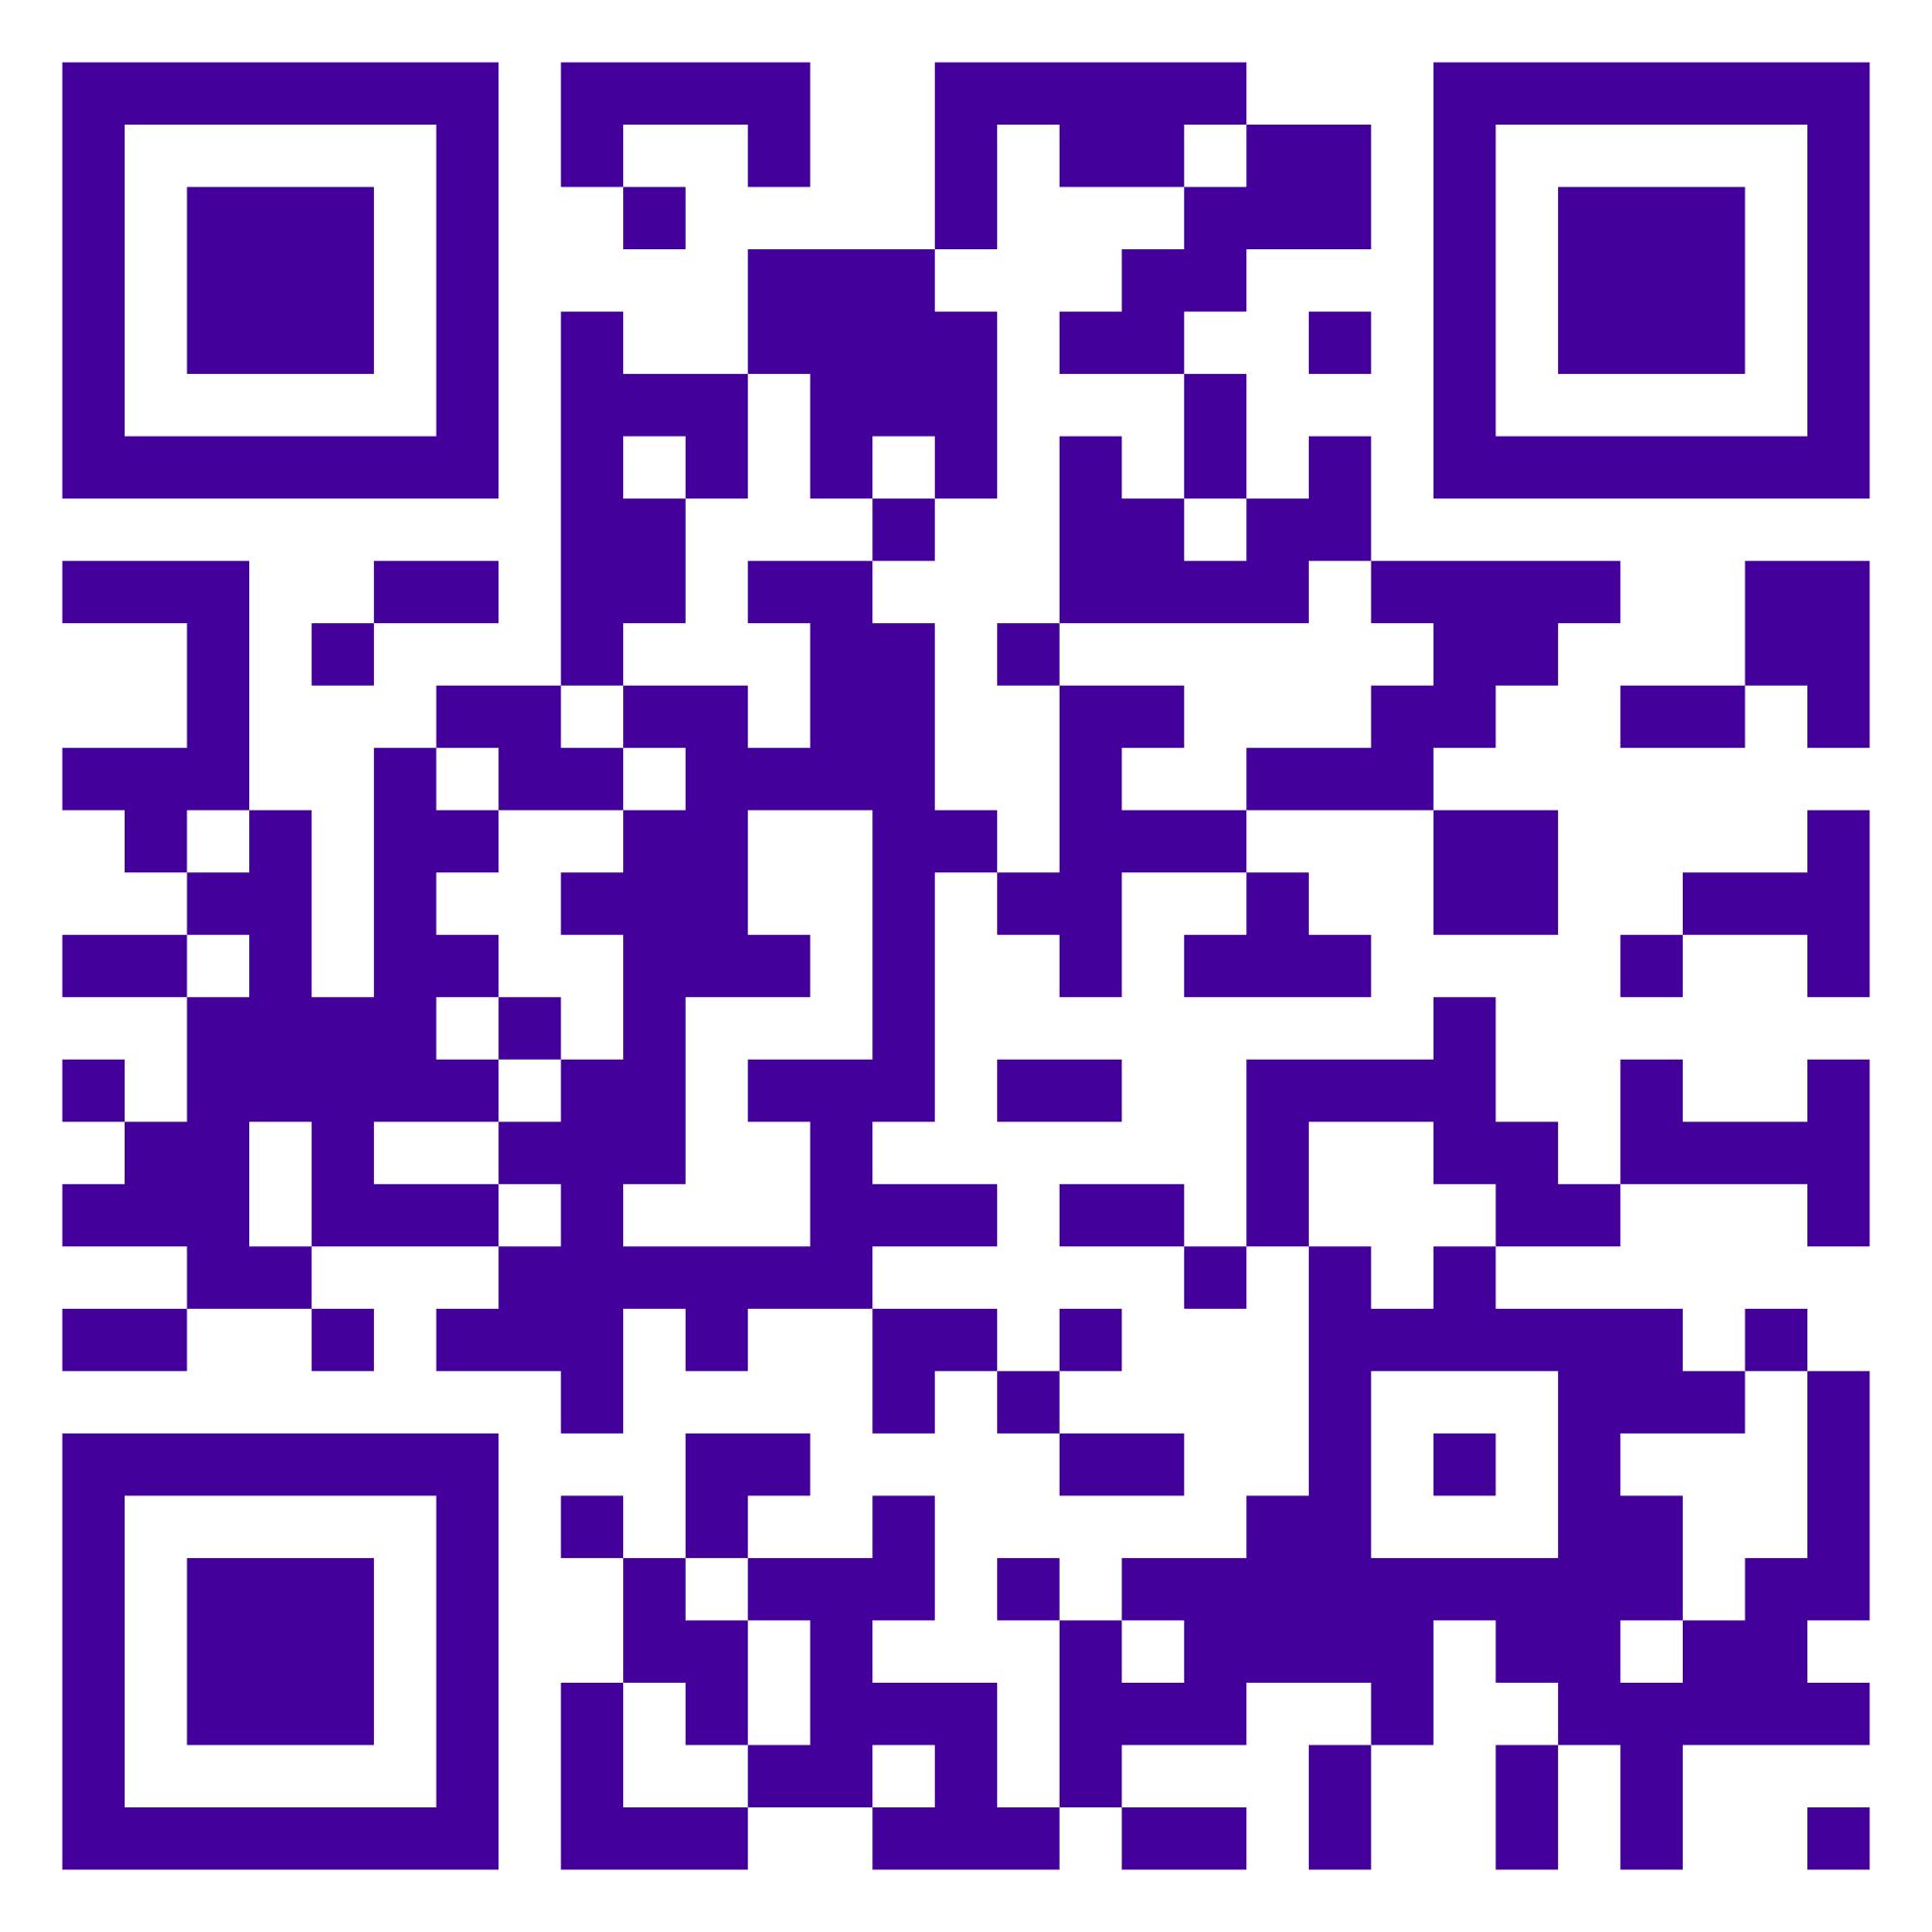 Nintendo 3DS Wallpaper Codes